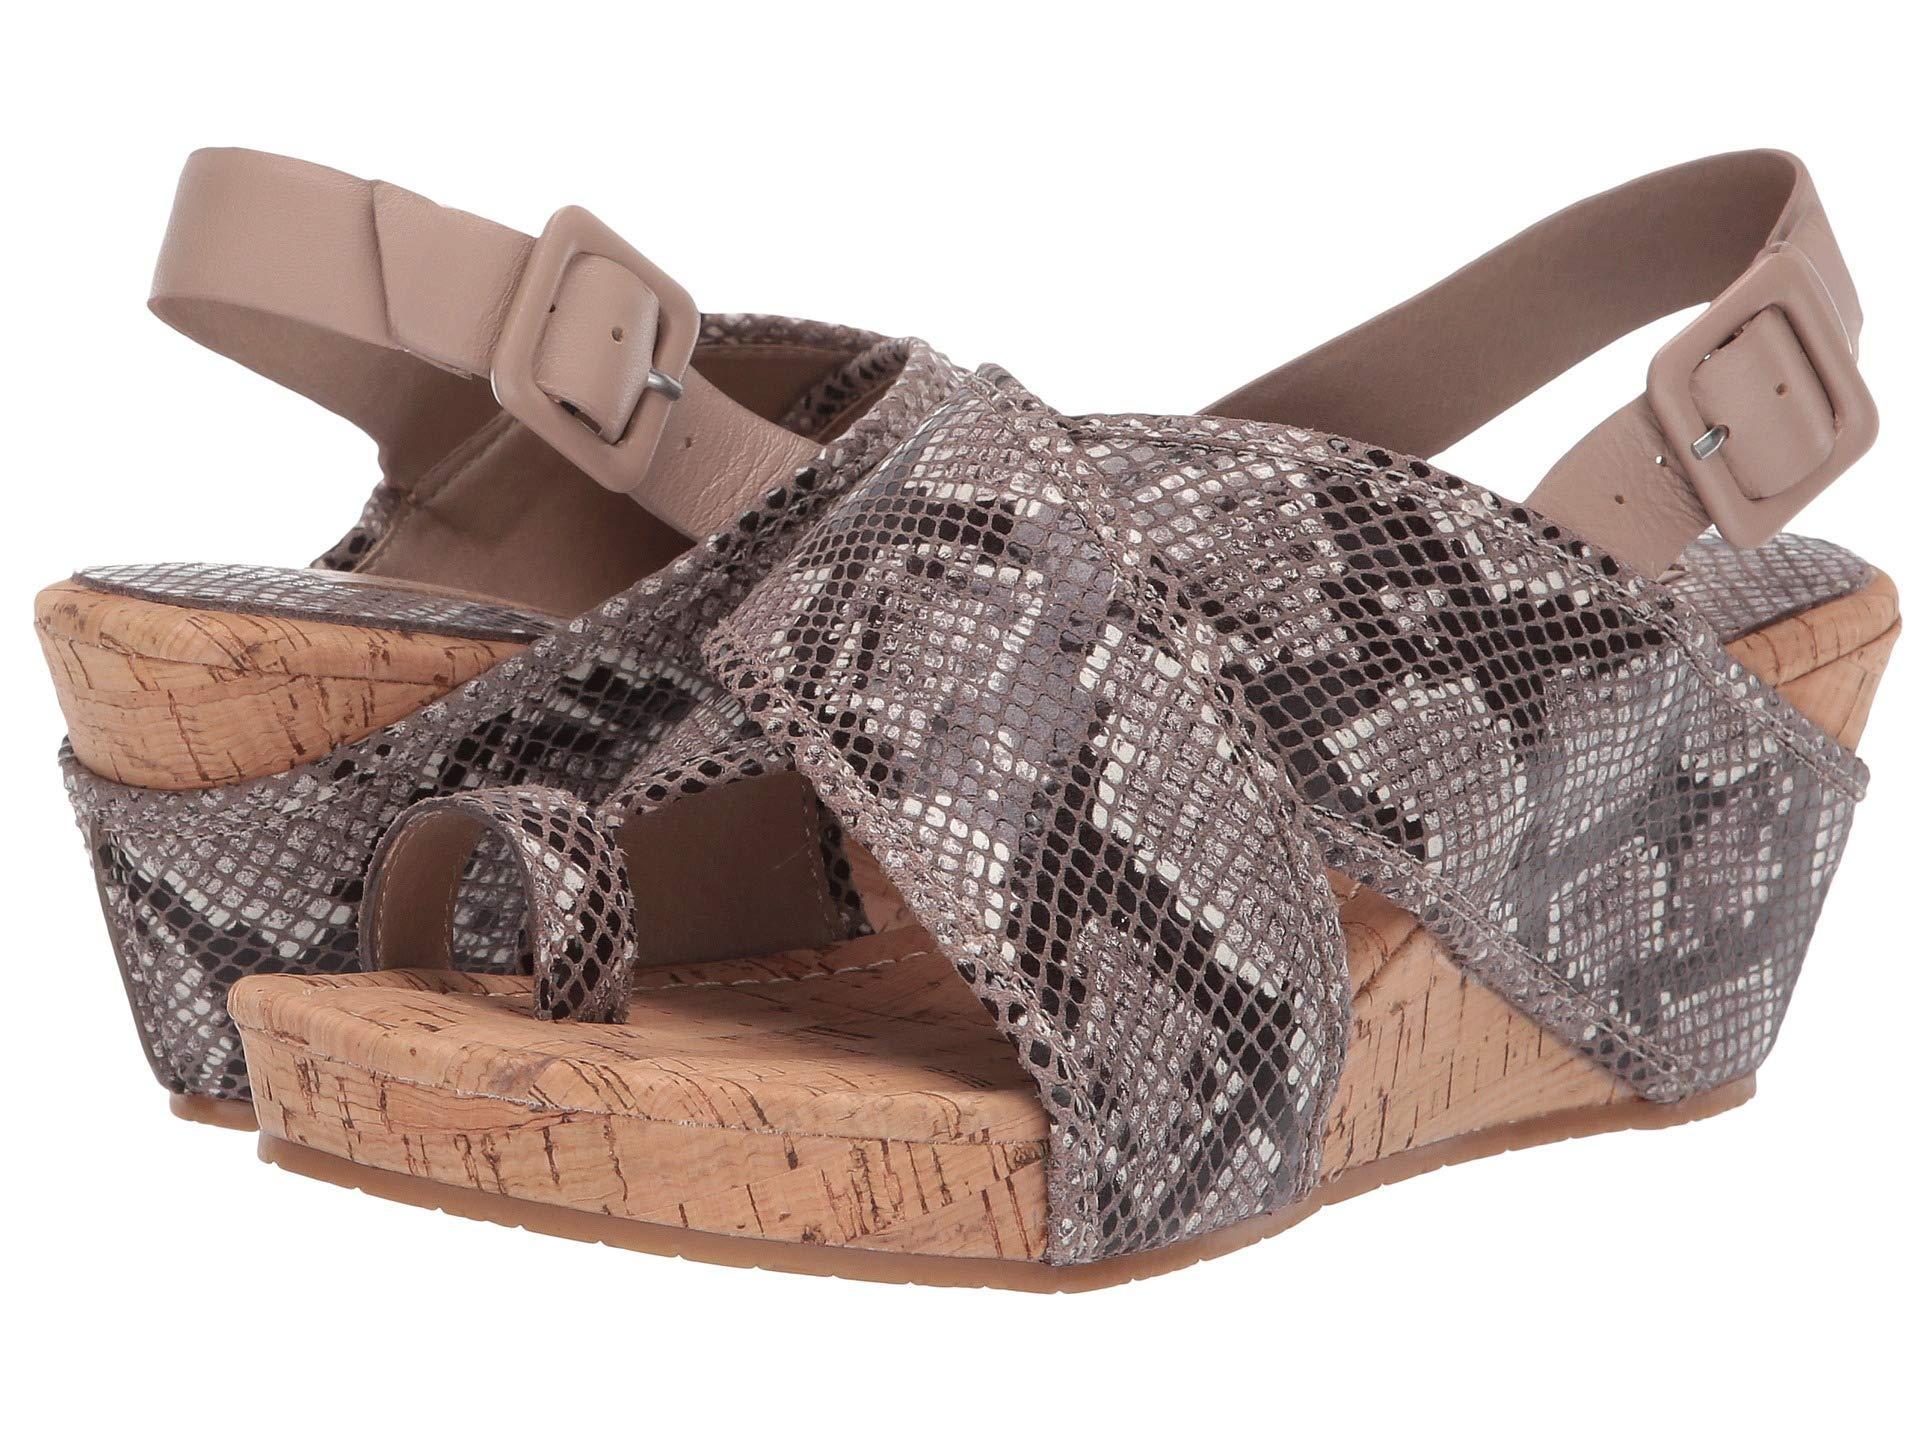 186e0860ef3 Lyst - Donald J Pliner Gary (navy Python Print) Women s Wedge Shoes